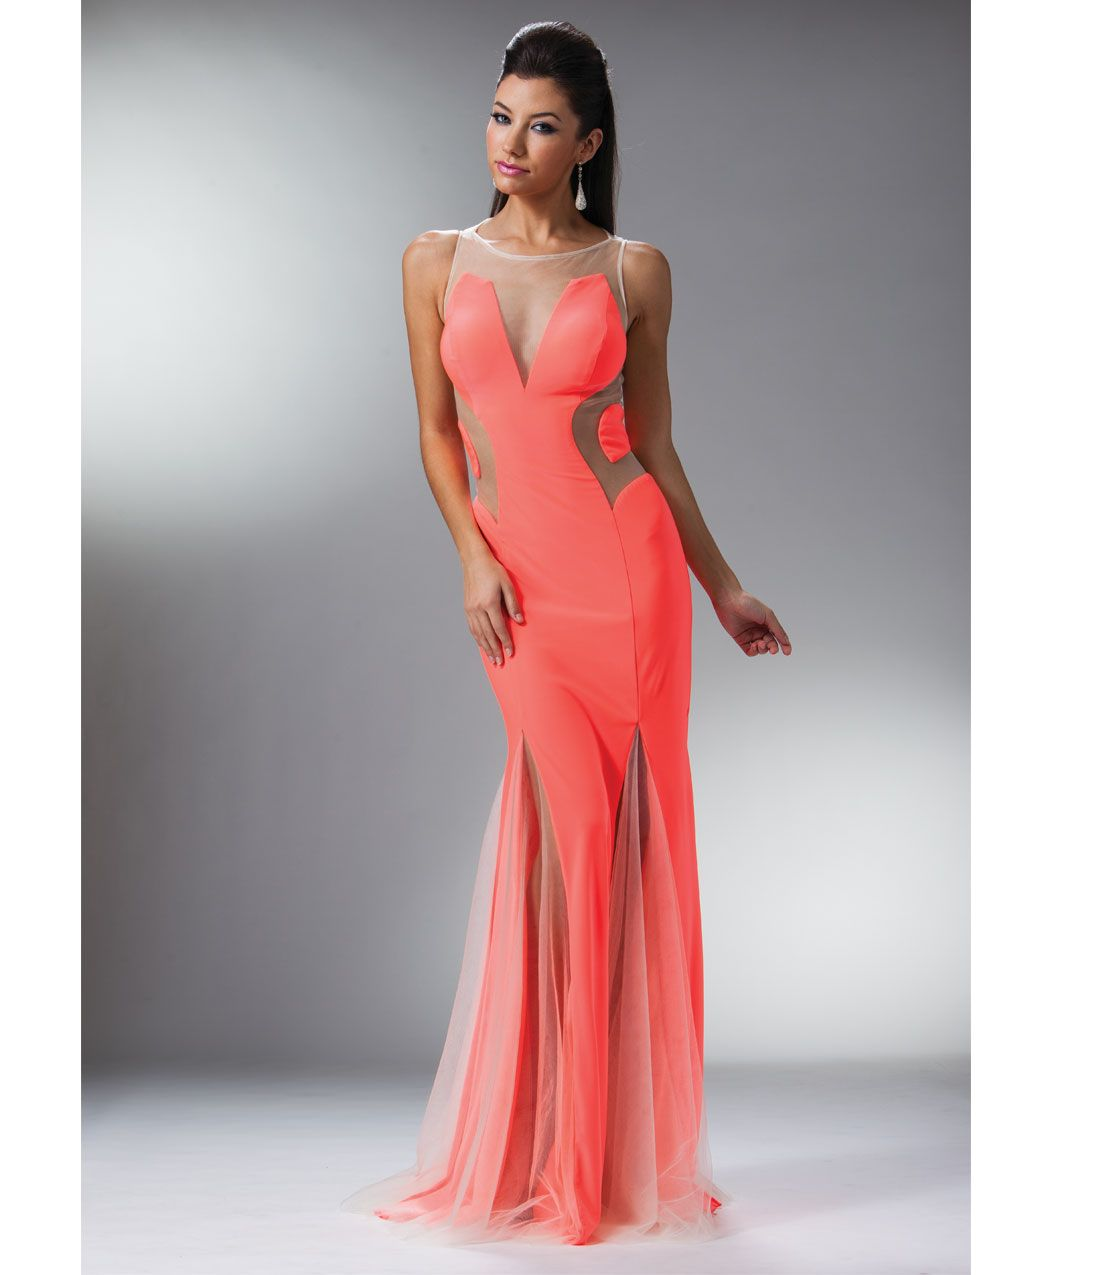 Long Fitted Prom Dresses - Ocodea.com